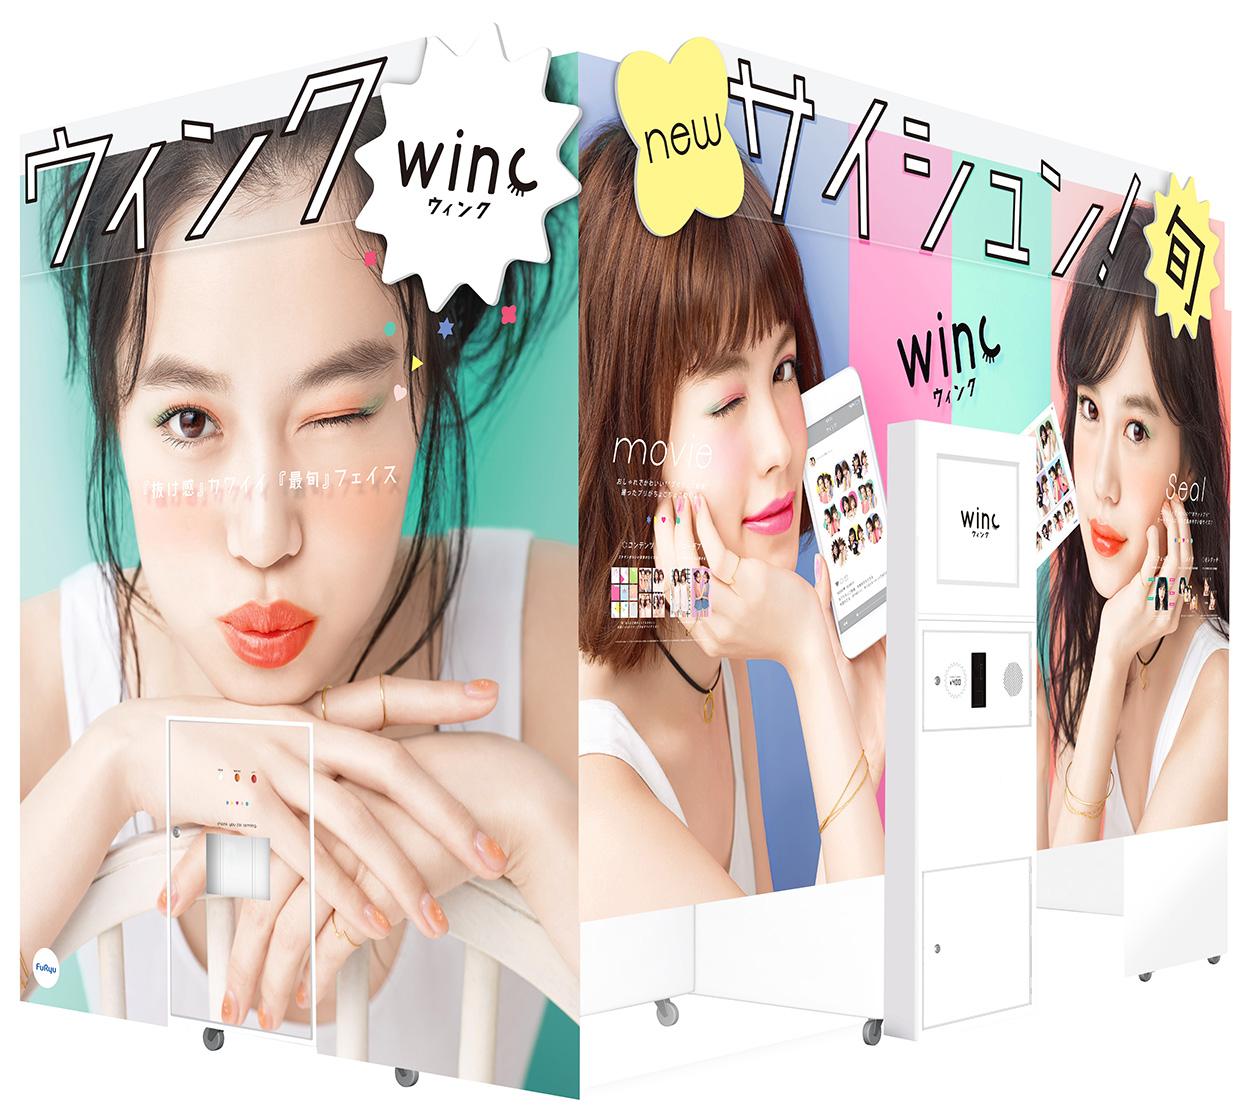 『winc』本体外観イメージ